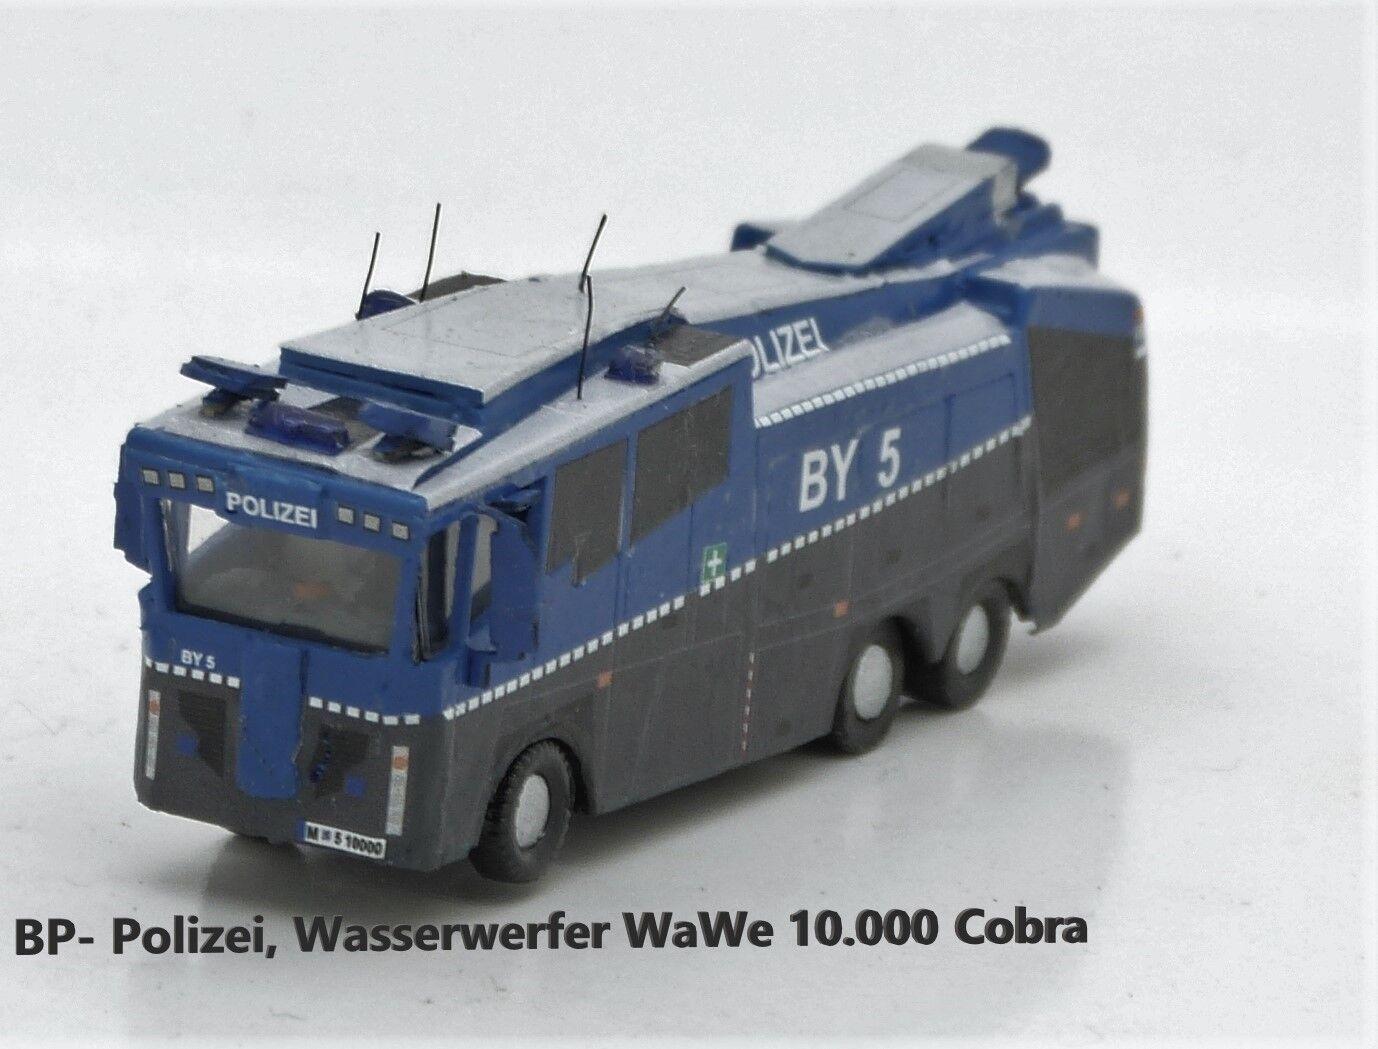 High Miniatures Track N 1 160 BP-Police, water cannon WAWE 10 Cobra